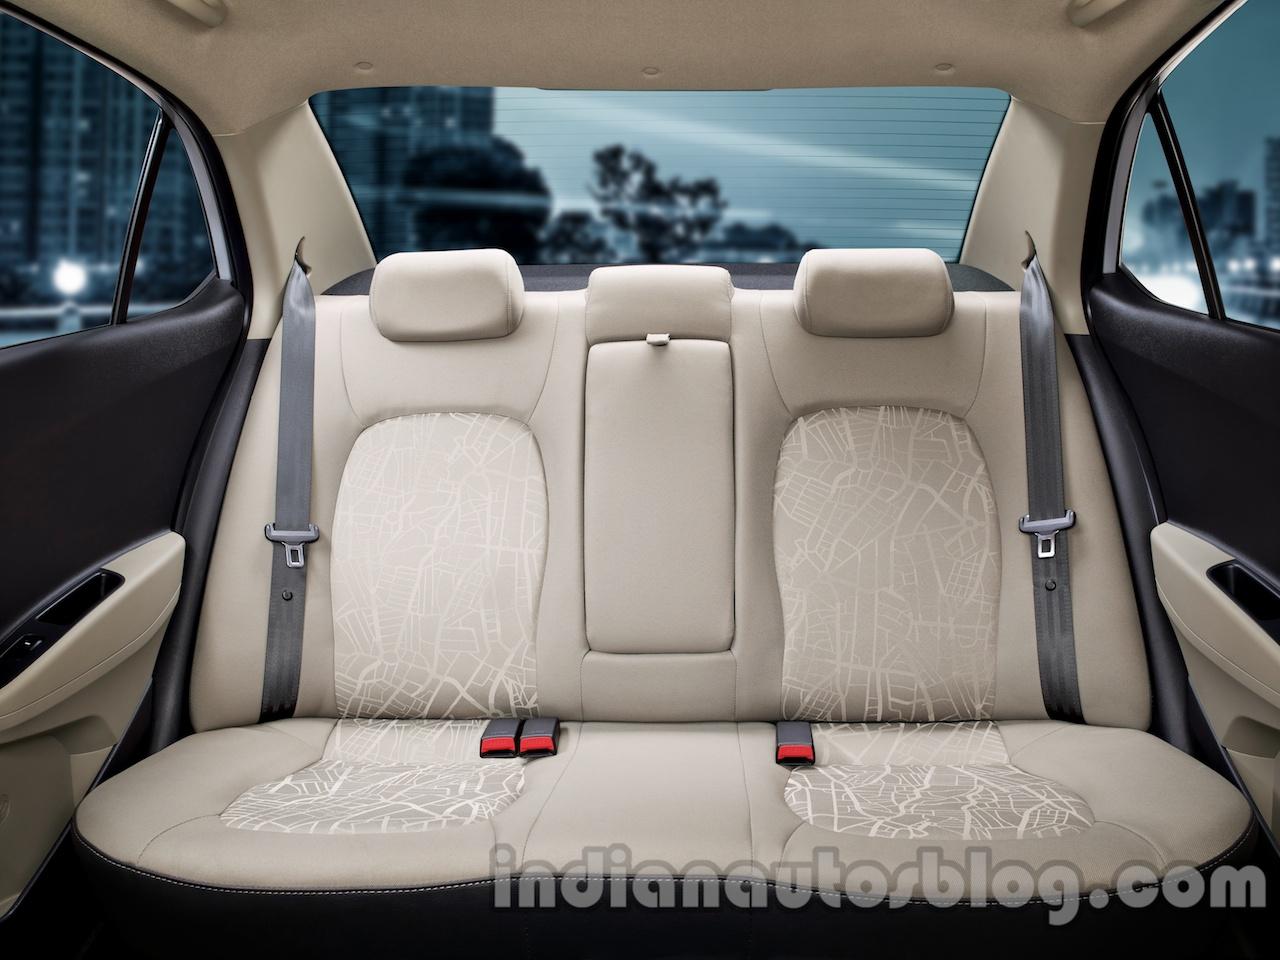 Hyundai Xcent rear seat